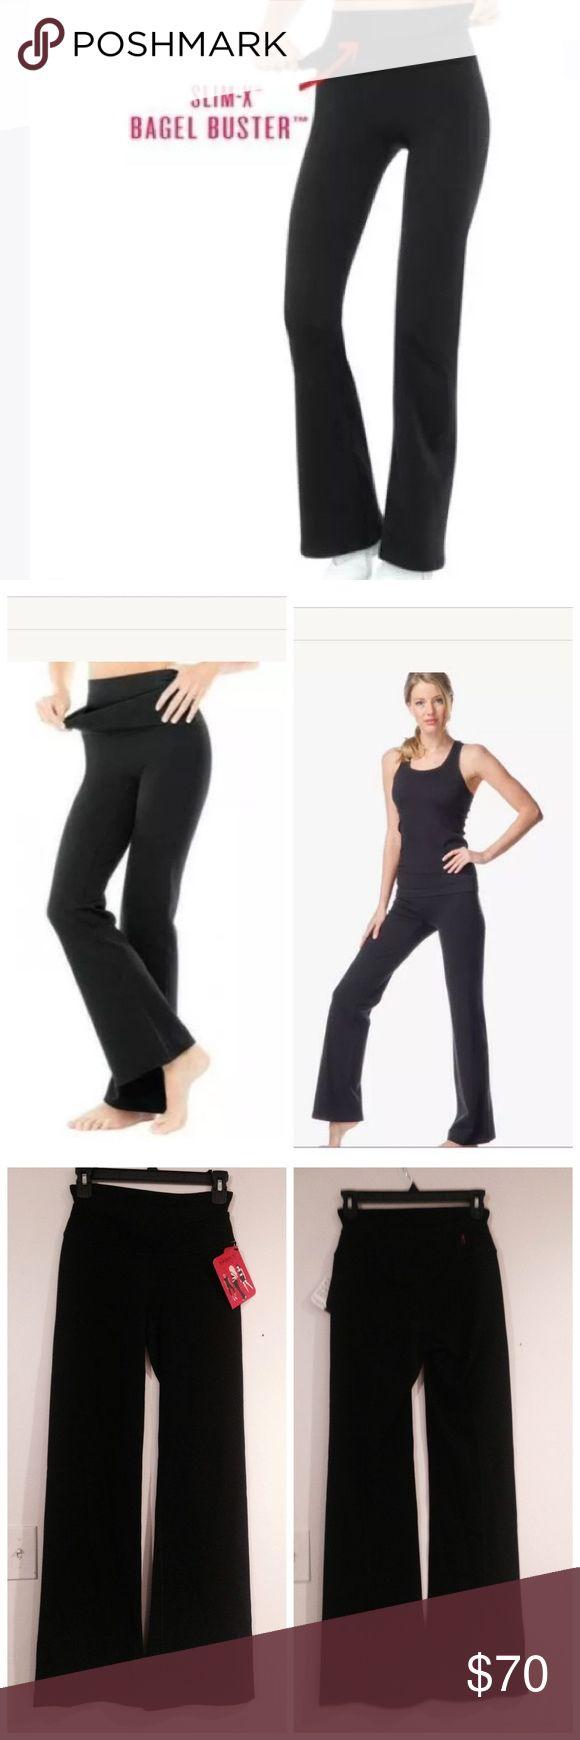 Selling this SPANX SlimX Bagel-Buster Power Yoga Pant Shapewear on Poshmark! My username is: lo10mt. #shopmycloset #poshmark #fashion #shopping #style #forsale #SPANX #Pants